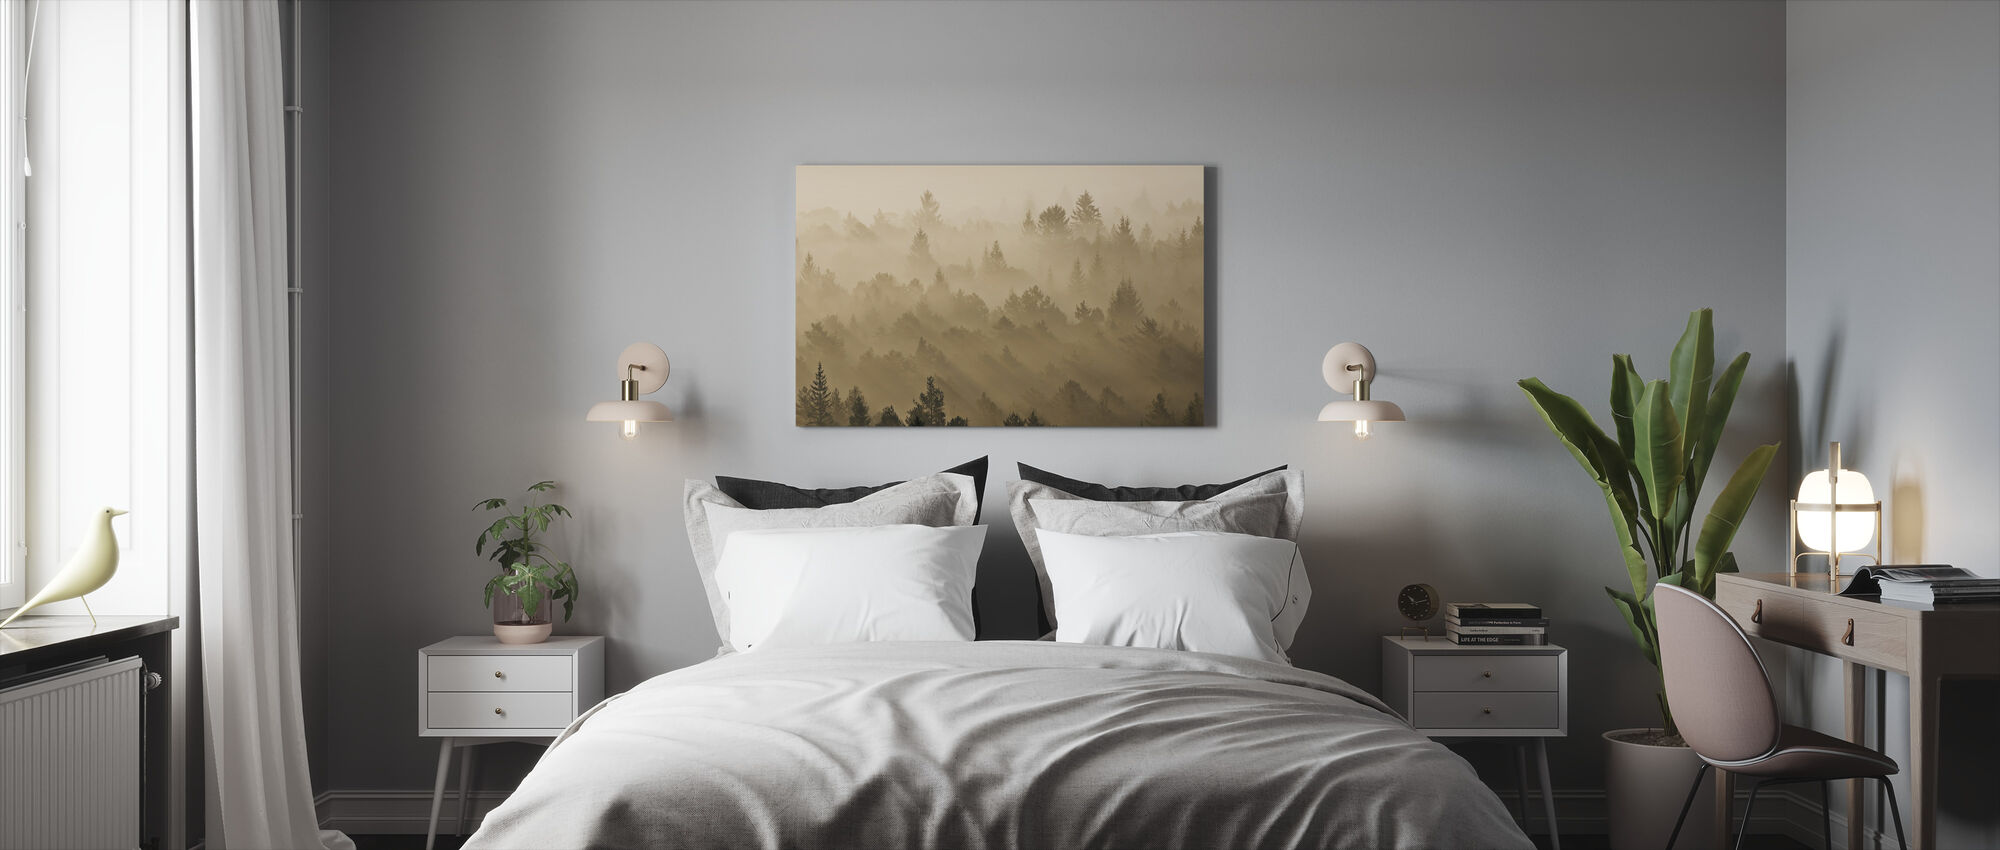 Morning Mist in Isar Valley - Canvas print - Bedroom